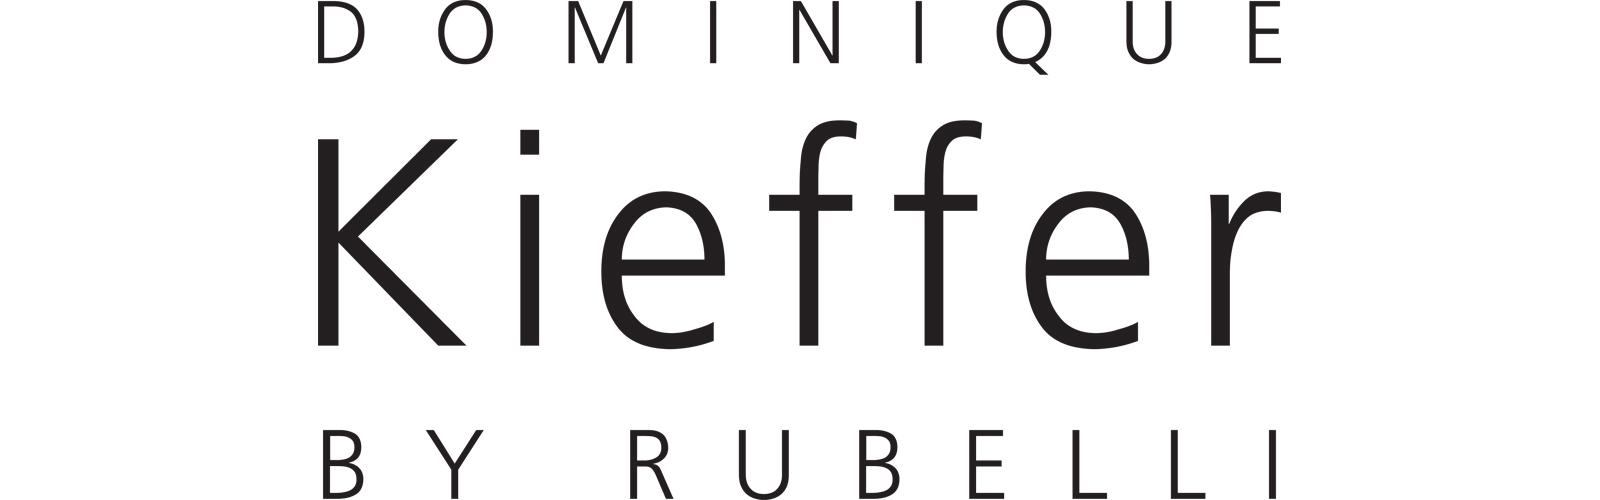 kieffer by rubelli